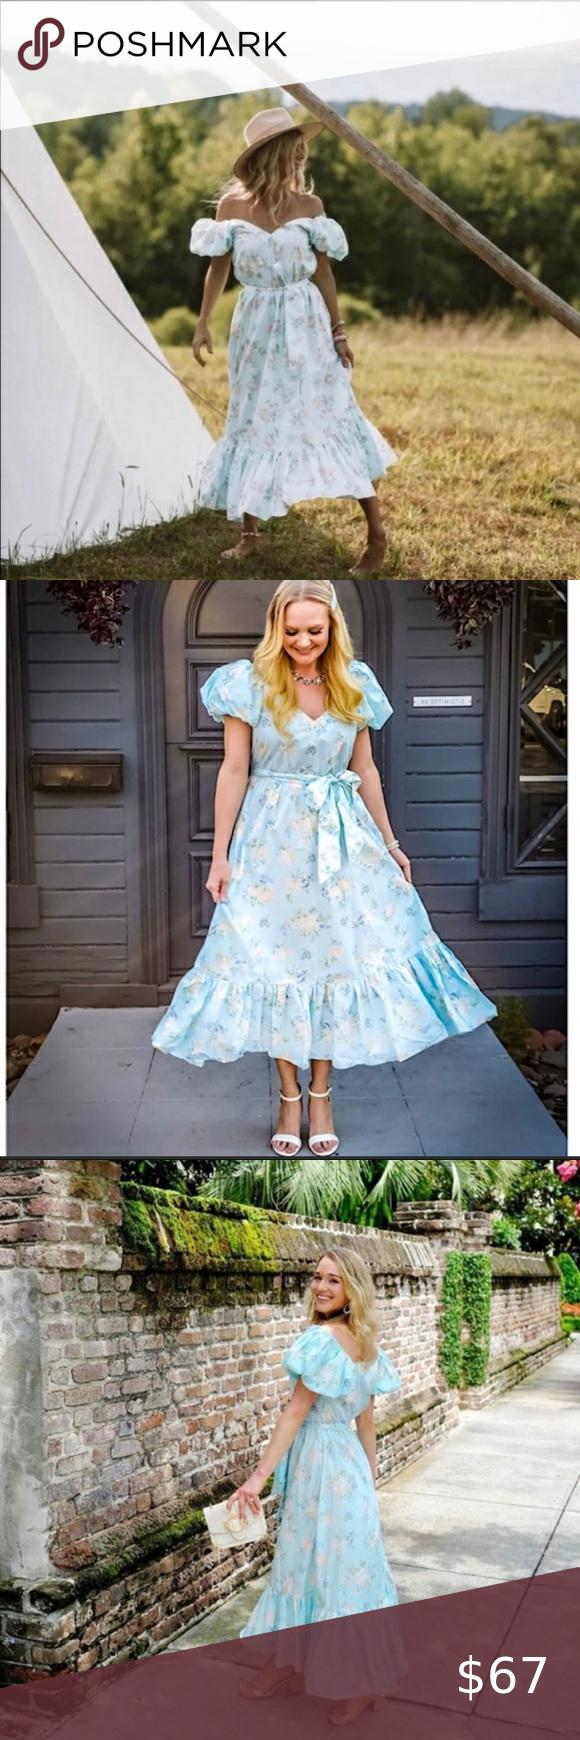 Loveshackfancy Target Estelle Blue Floral Dress Floral Blue Dress Whimsical Fashion Fancy Maxi Dress [ 1740 x 580 Pixel ]